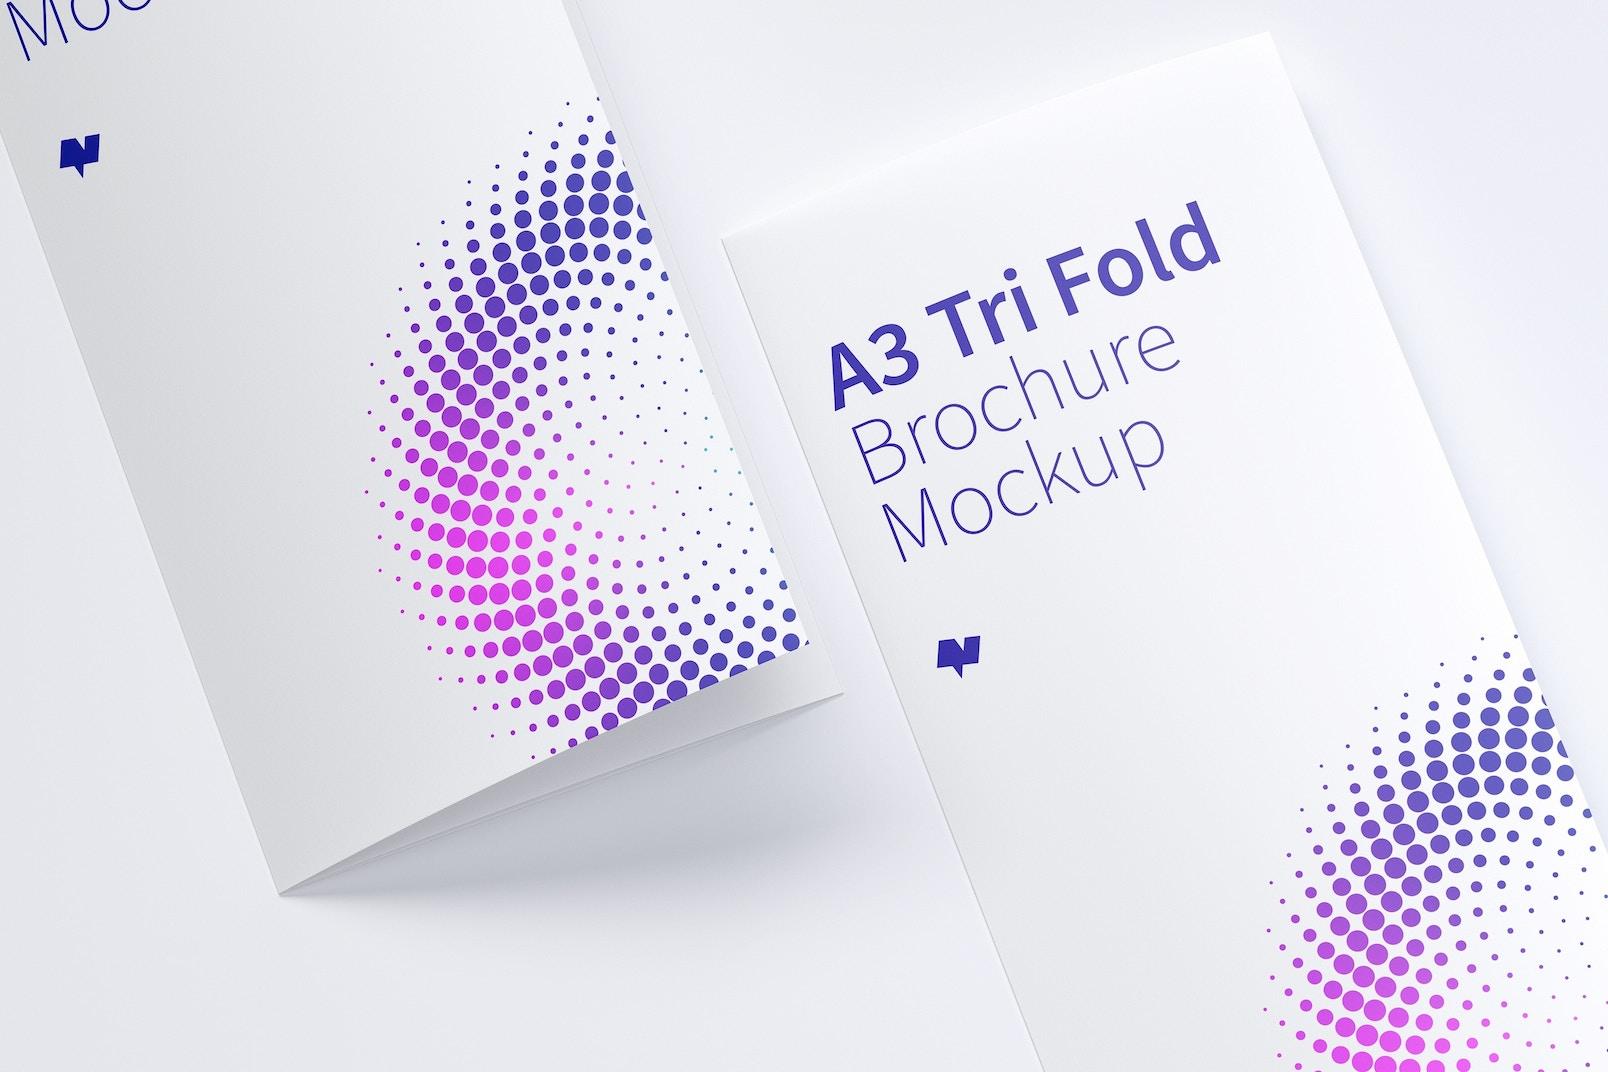 A3 Trifold Brochure Mockup 05